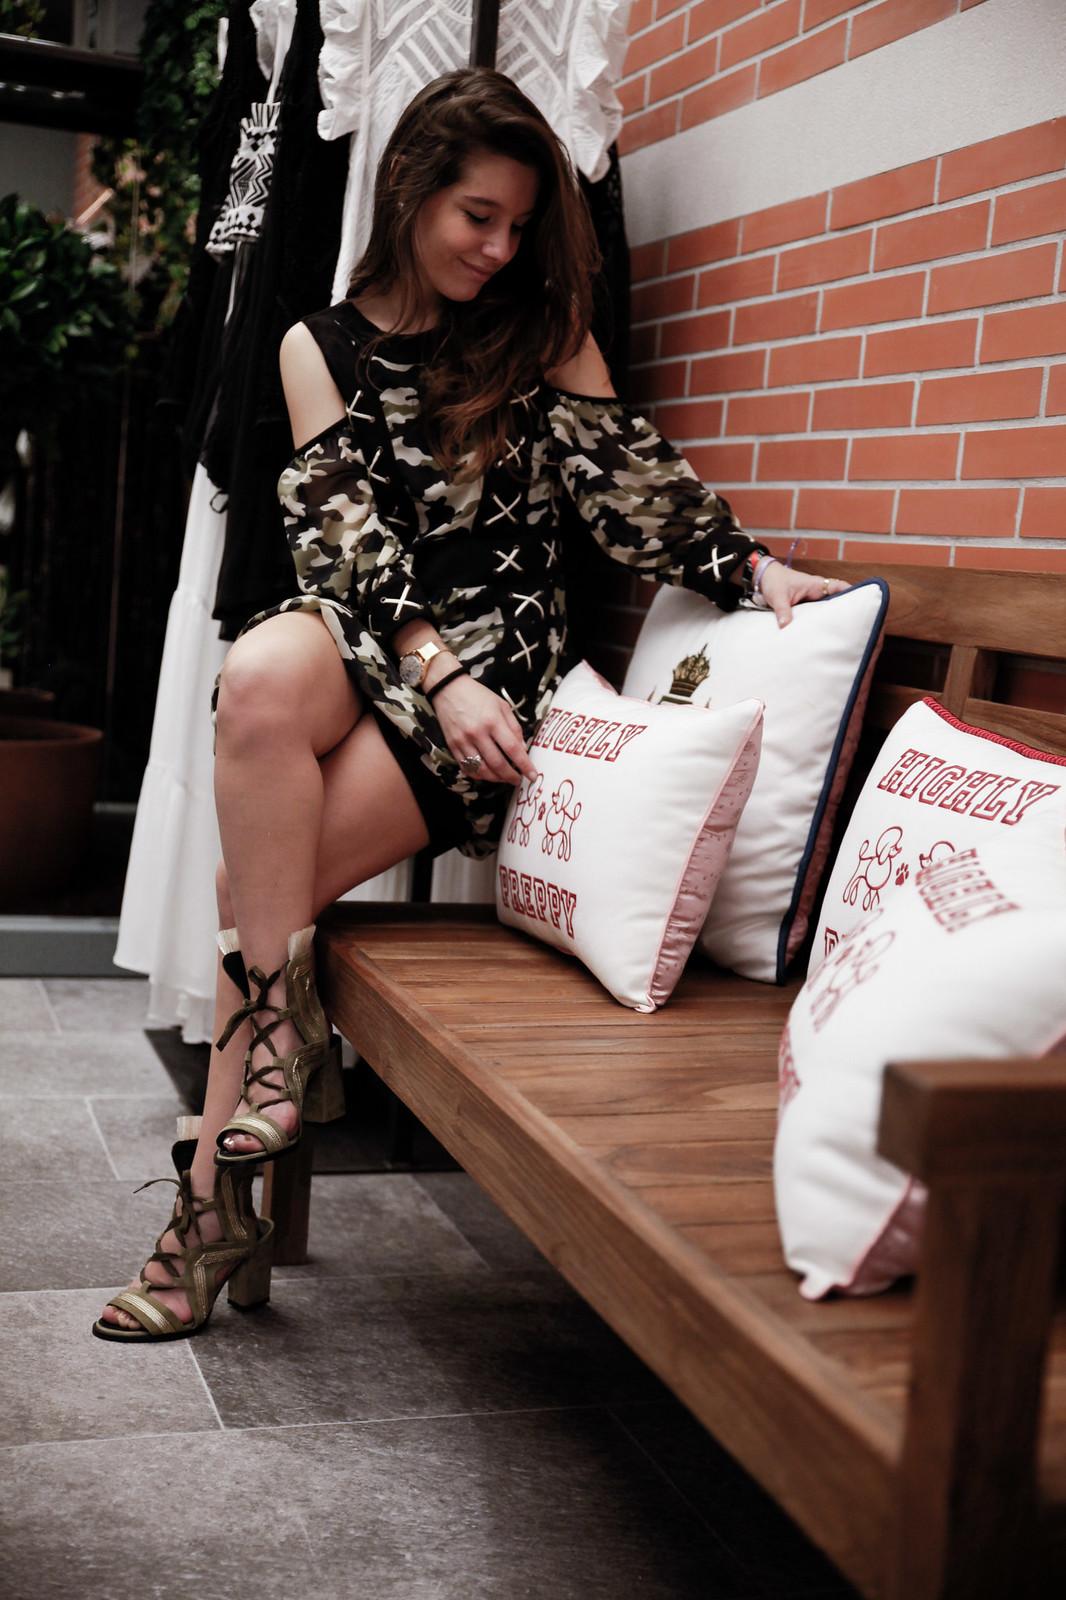 04_Highly_Preppy_abre_su_primera_tienda_en_Bilbao_influencers_fashion_lifestyle_theguestgirl_look_military_khaki_ootd